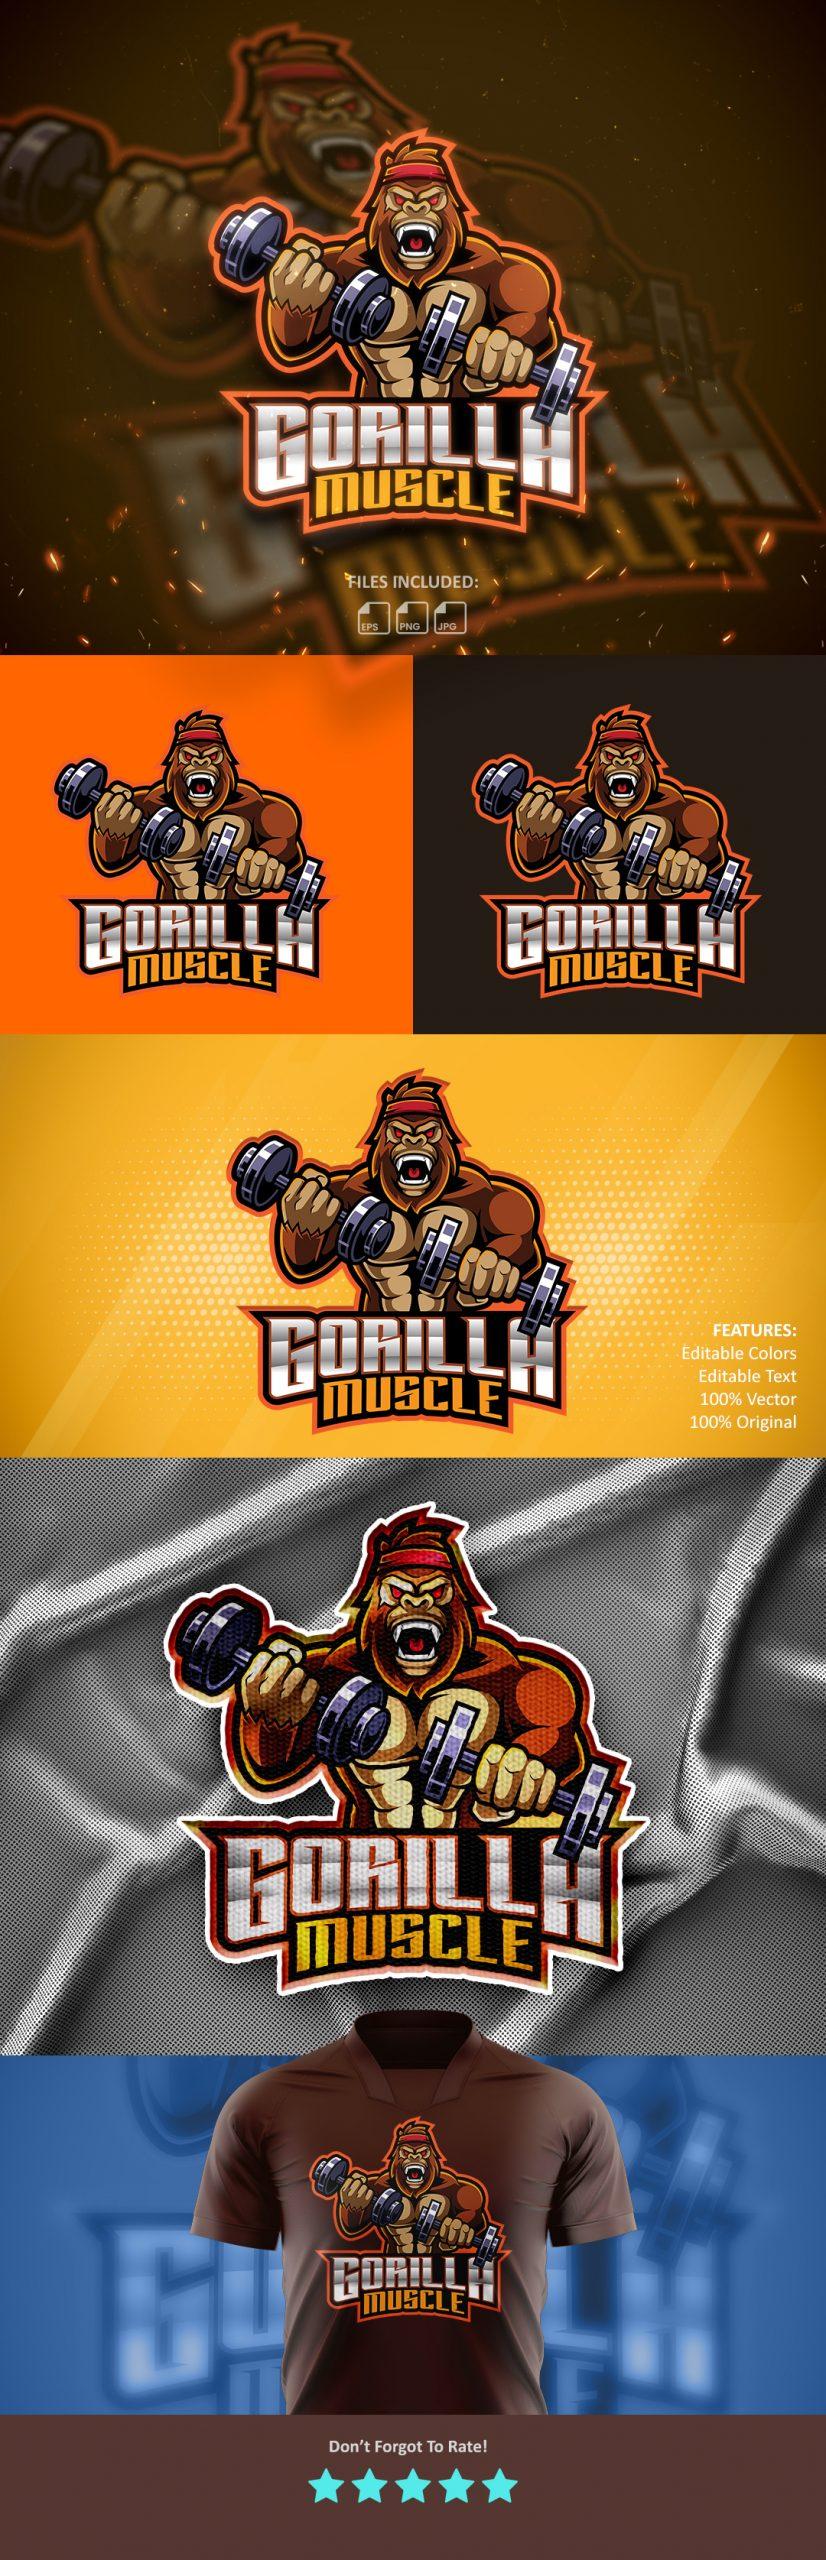 Free-Download-Gorilla-Muscle-Mascot-Logo